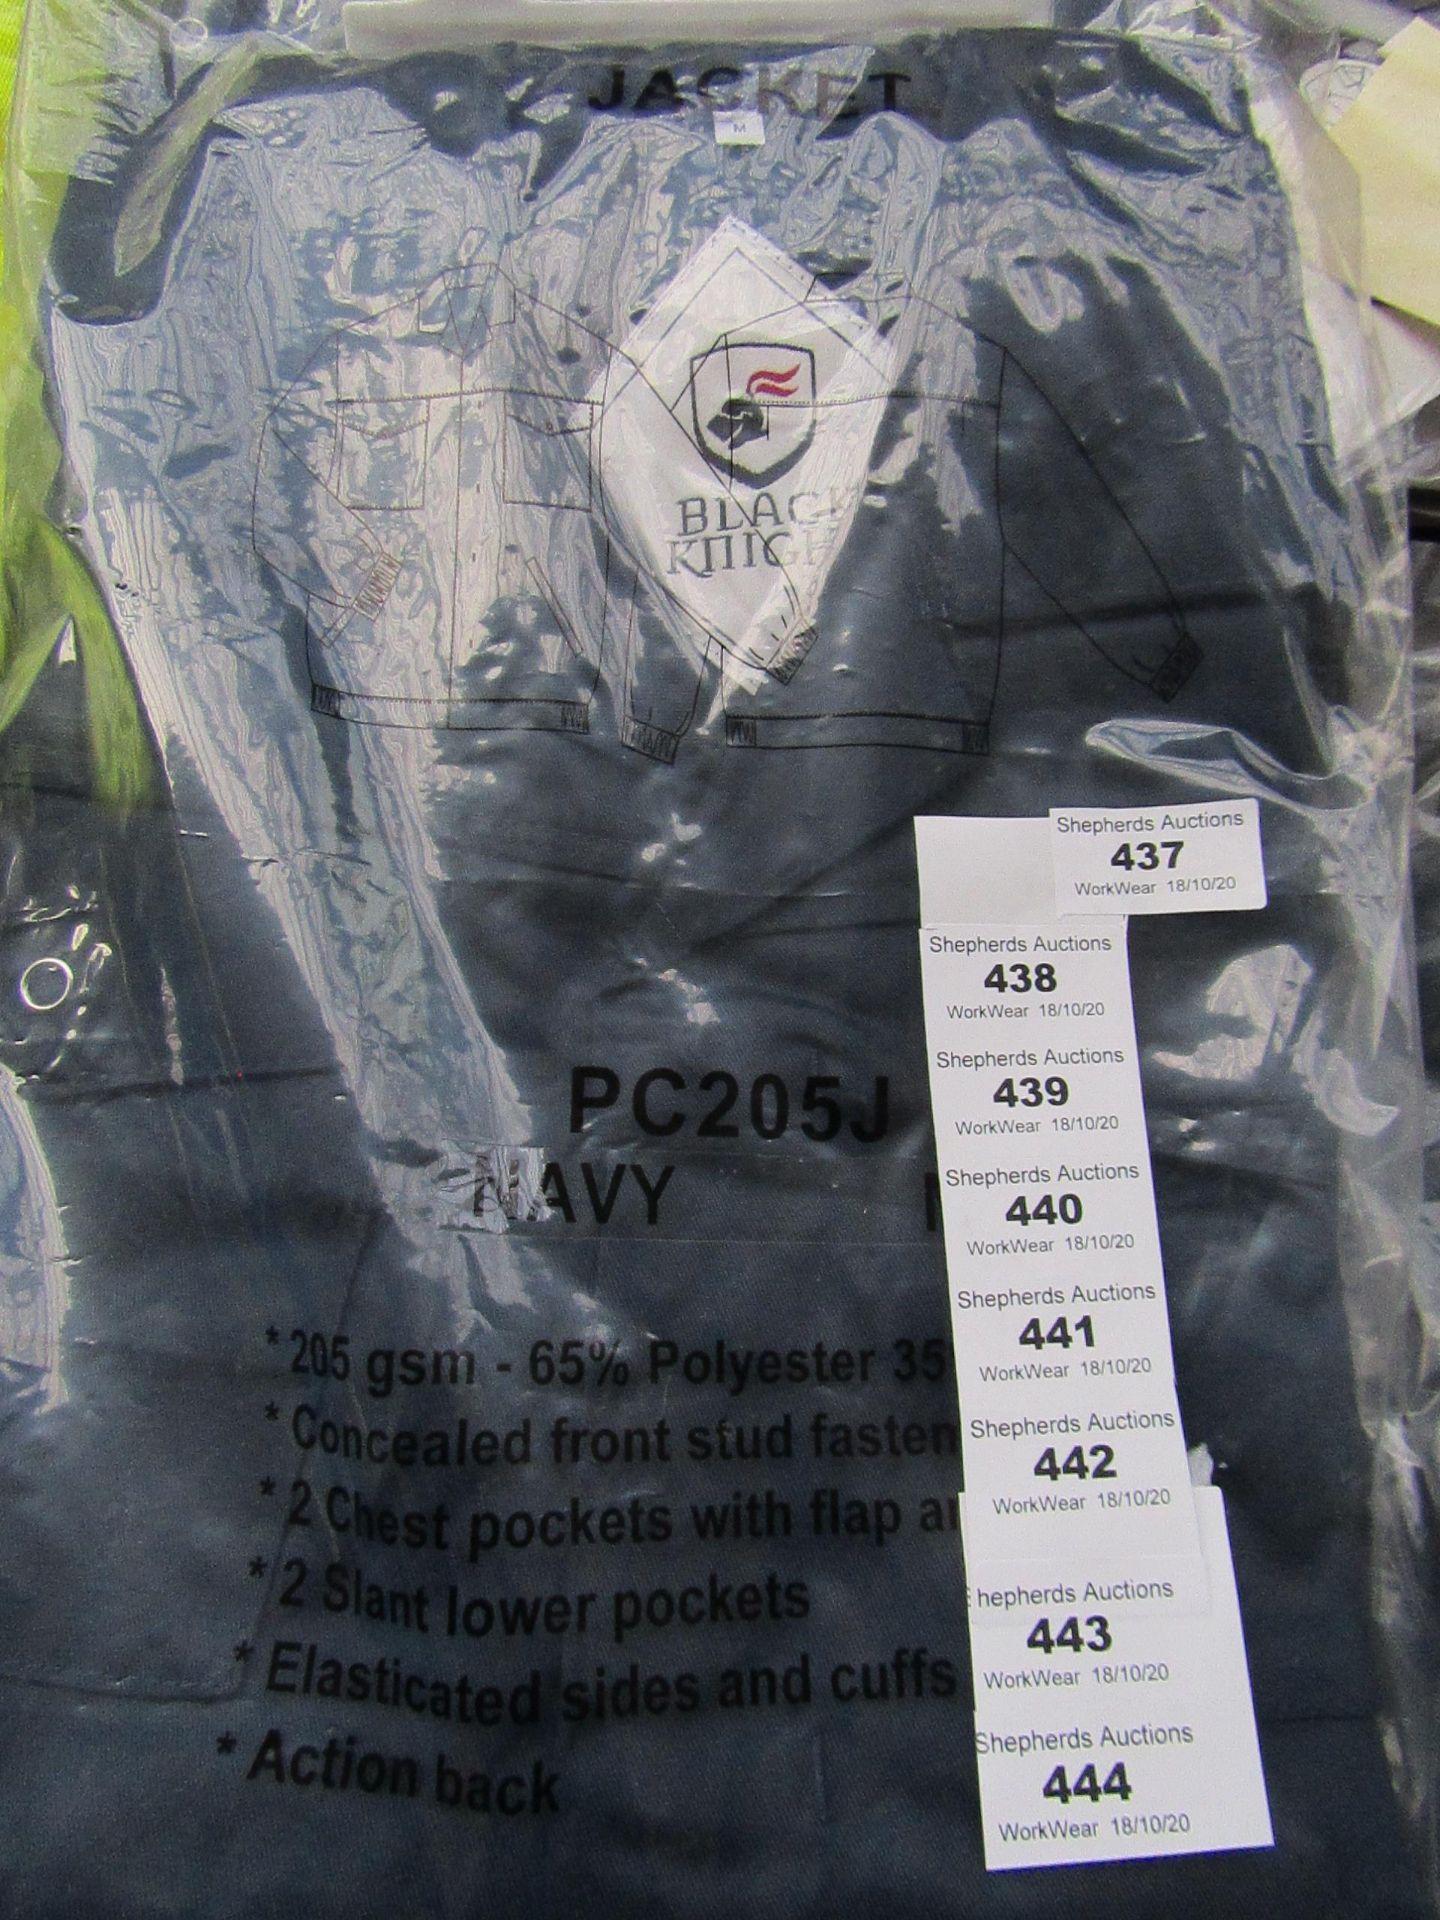 Lot 439 - Black Knight - Navy Jacket - Size Medium - Unused & Packaged.